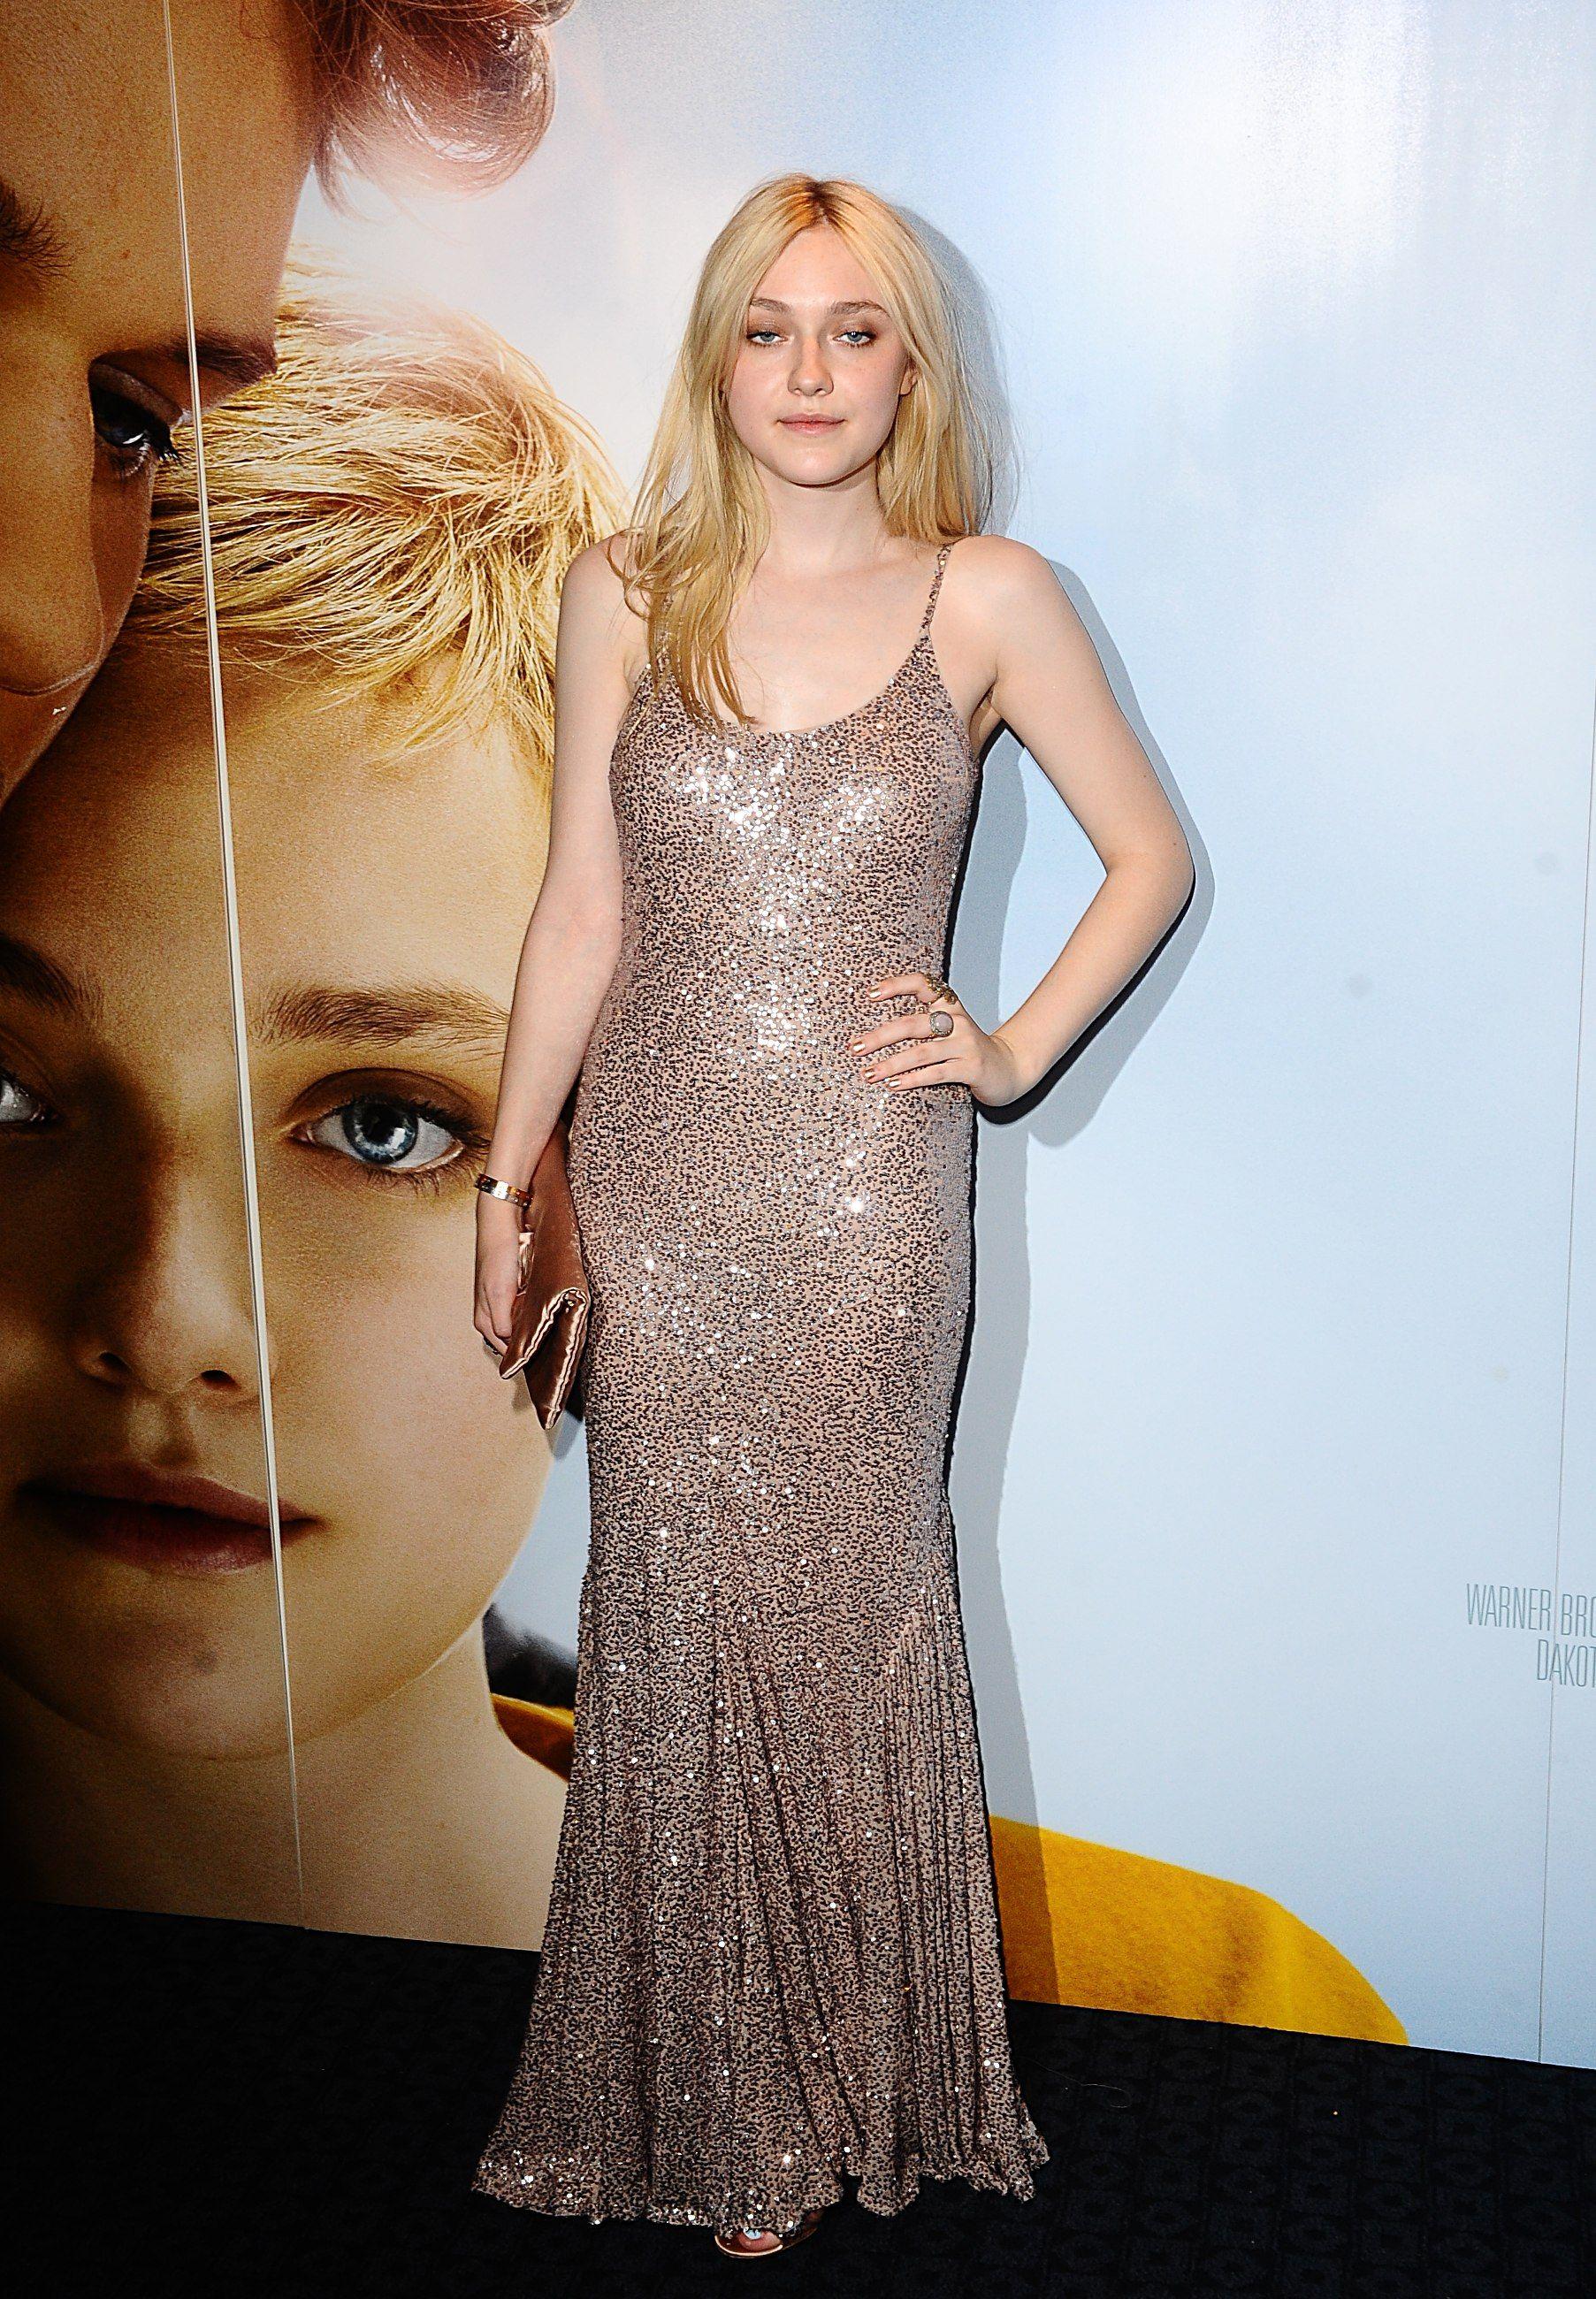 Dakota Fanning: 'Don't judge Kristen'